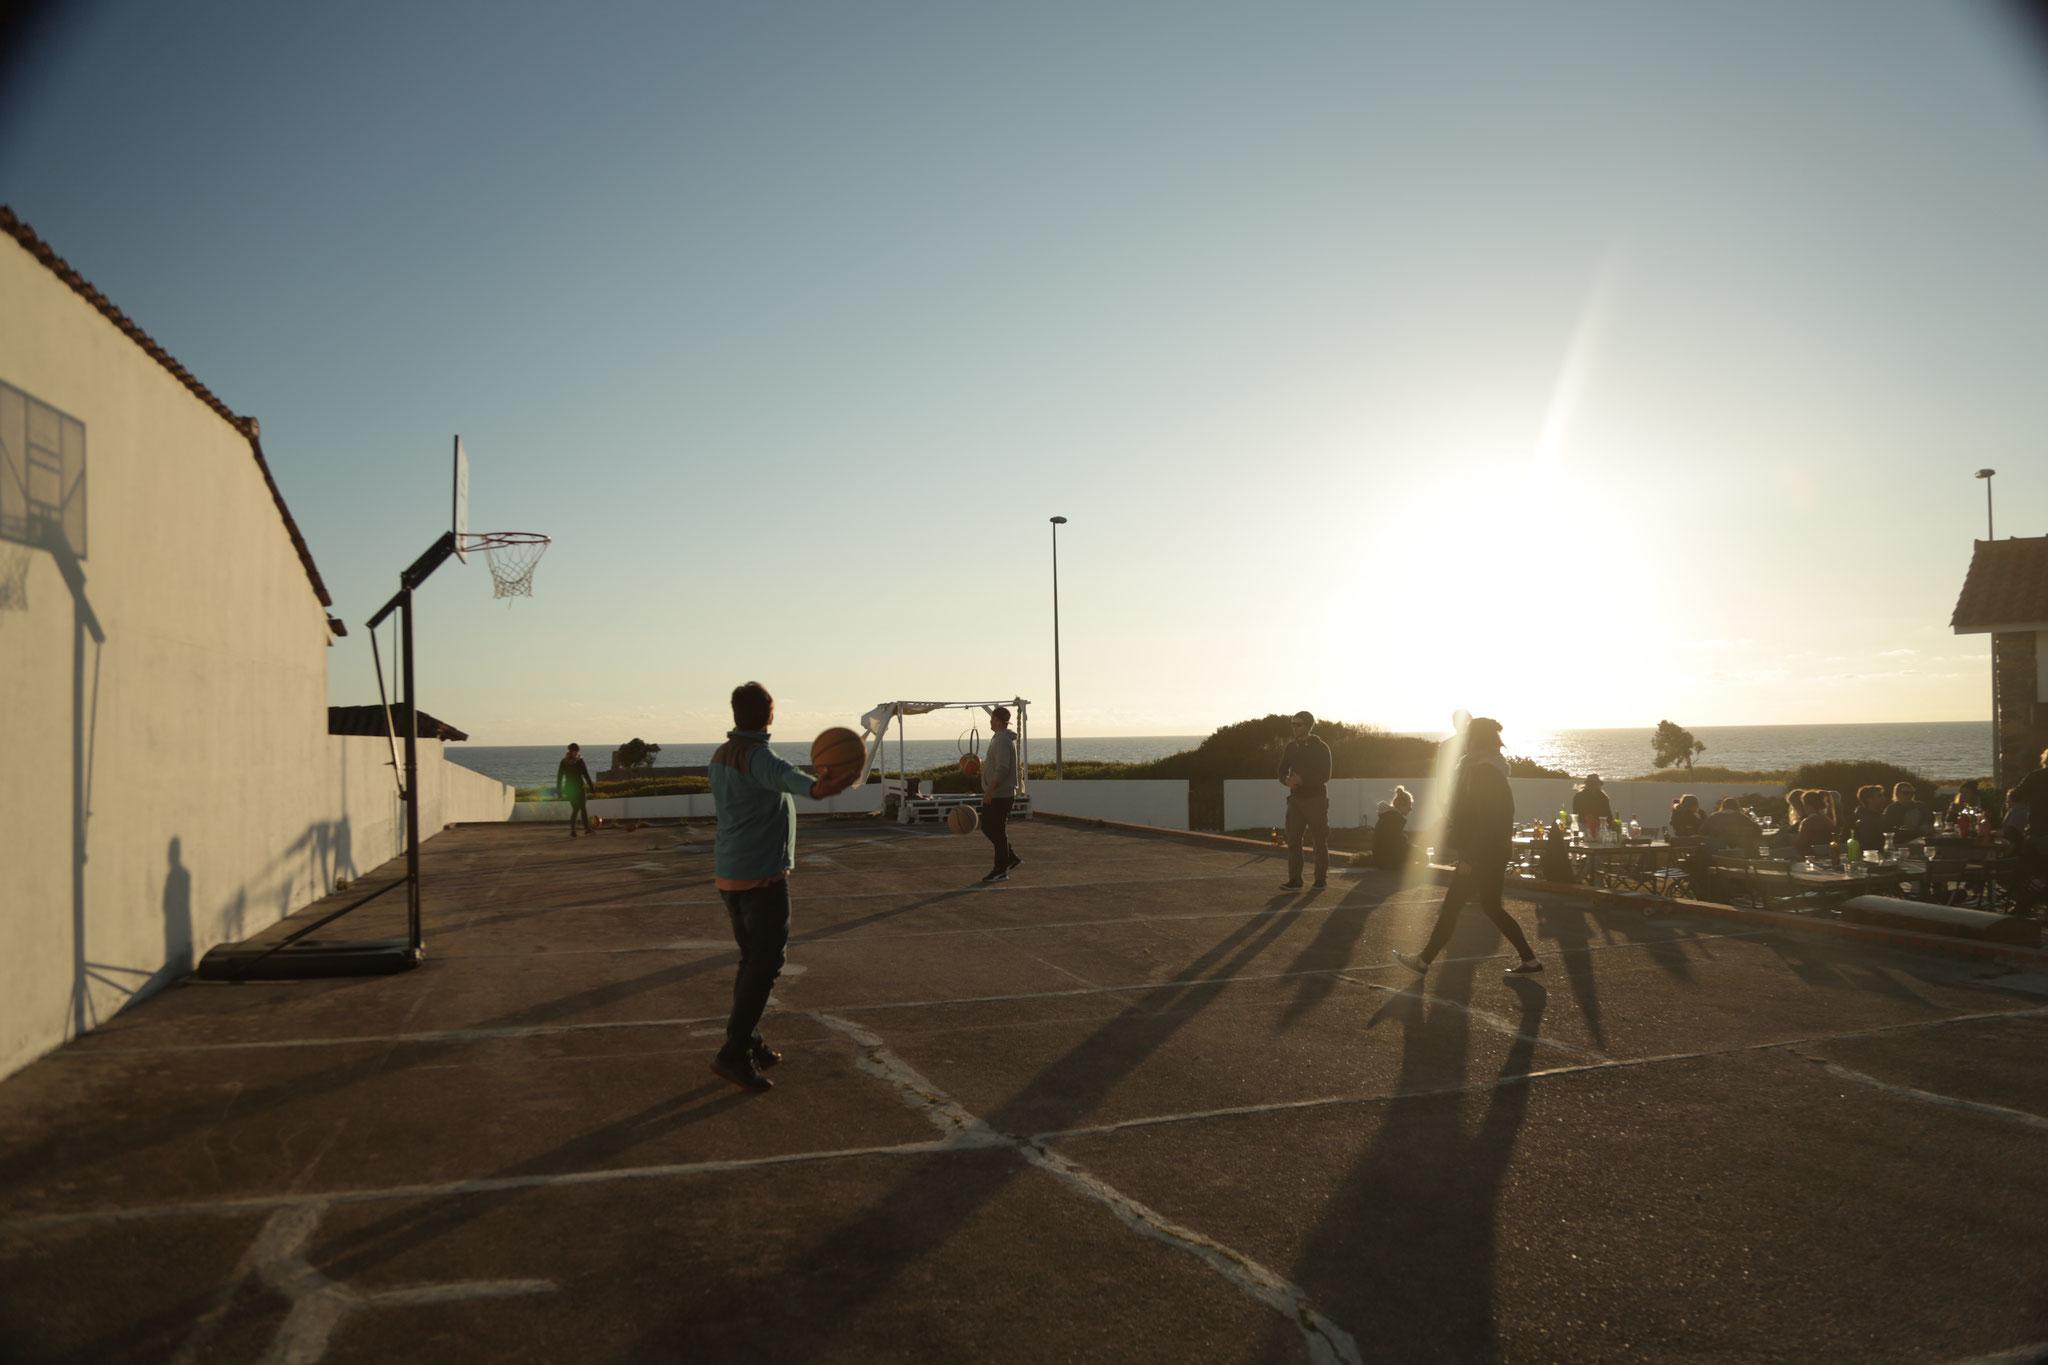 Photocredit: Rhea Schmidt - Relax & Enjoy-Retreat, Portugal 2019